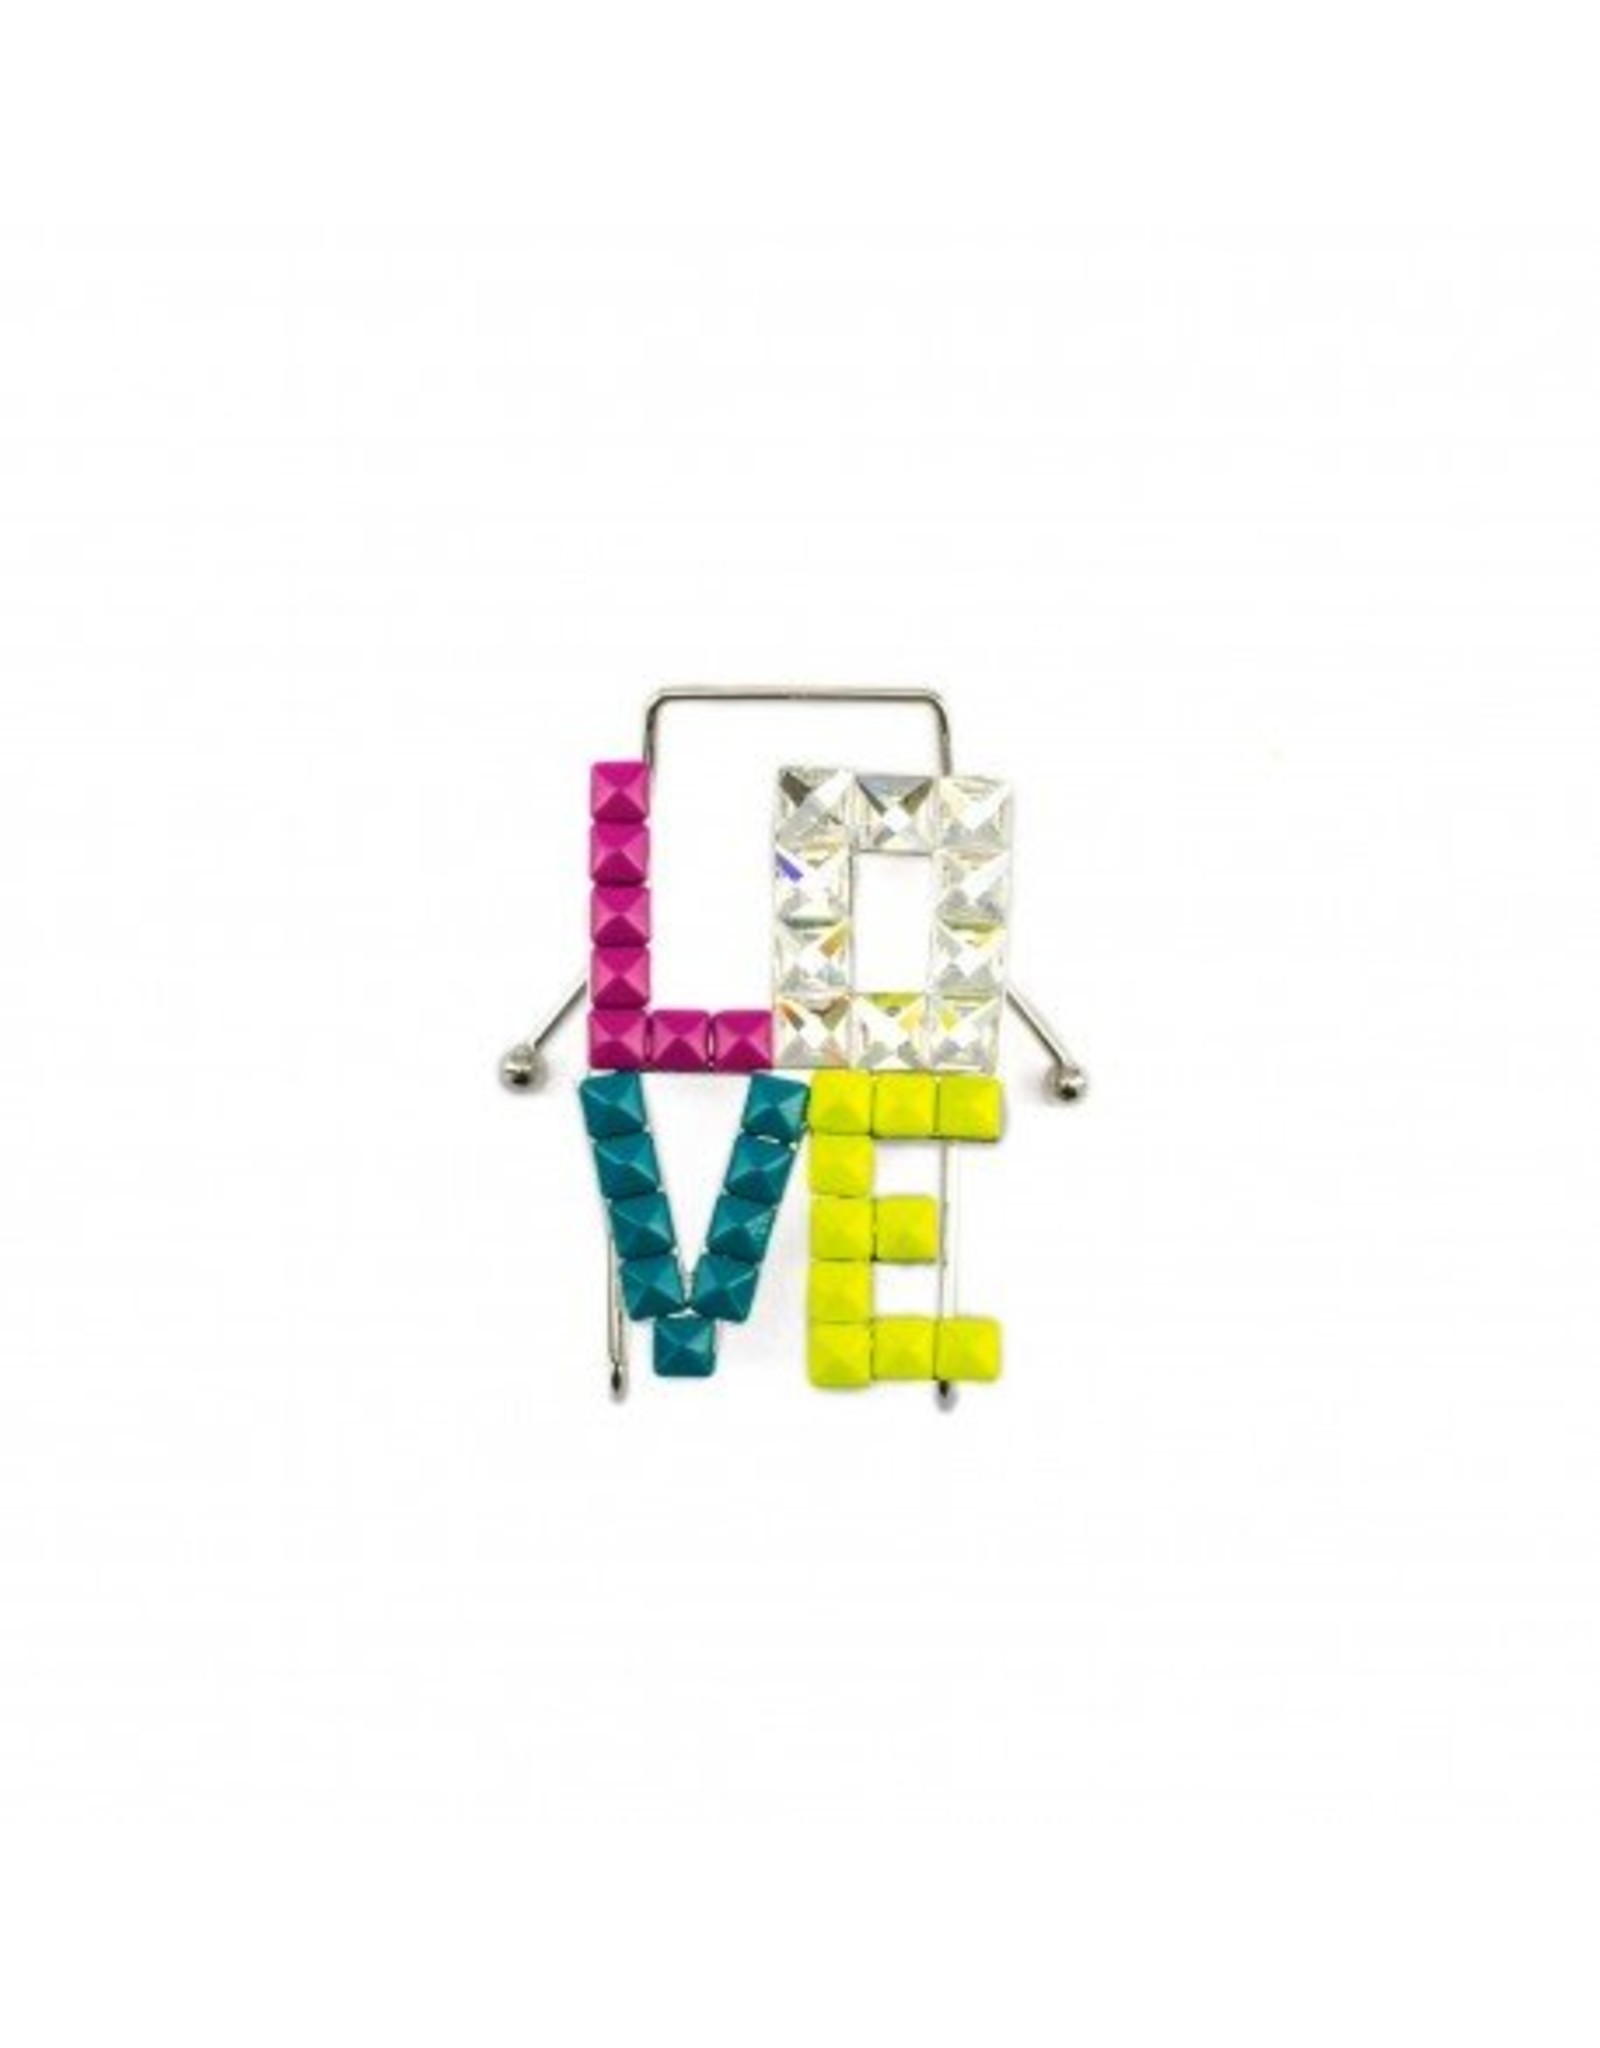 CLIP n GO Love Studs - Clip n Go Jewelry